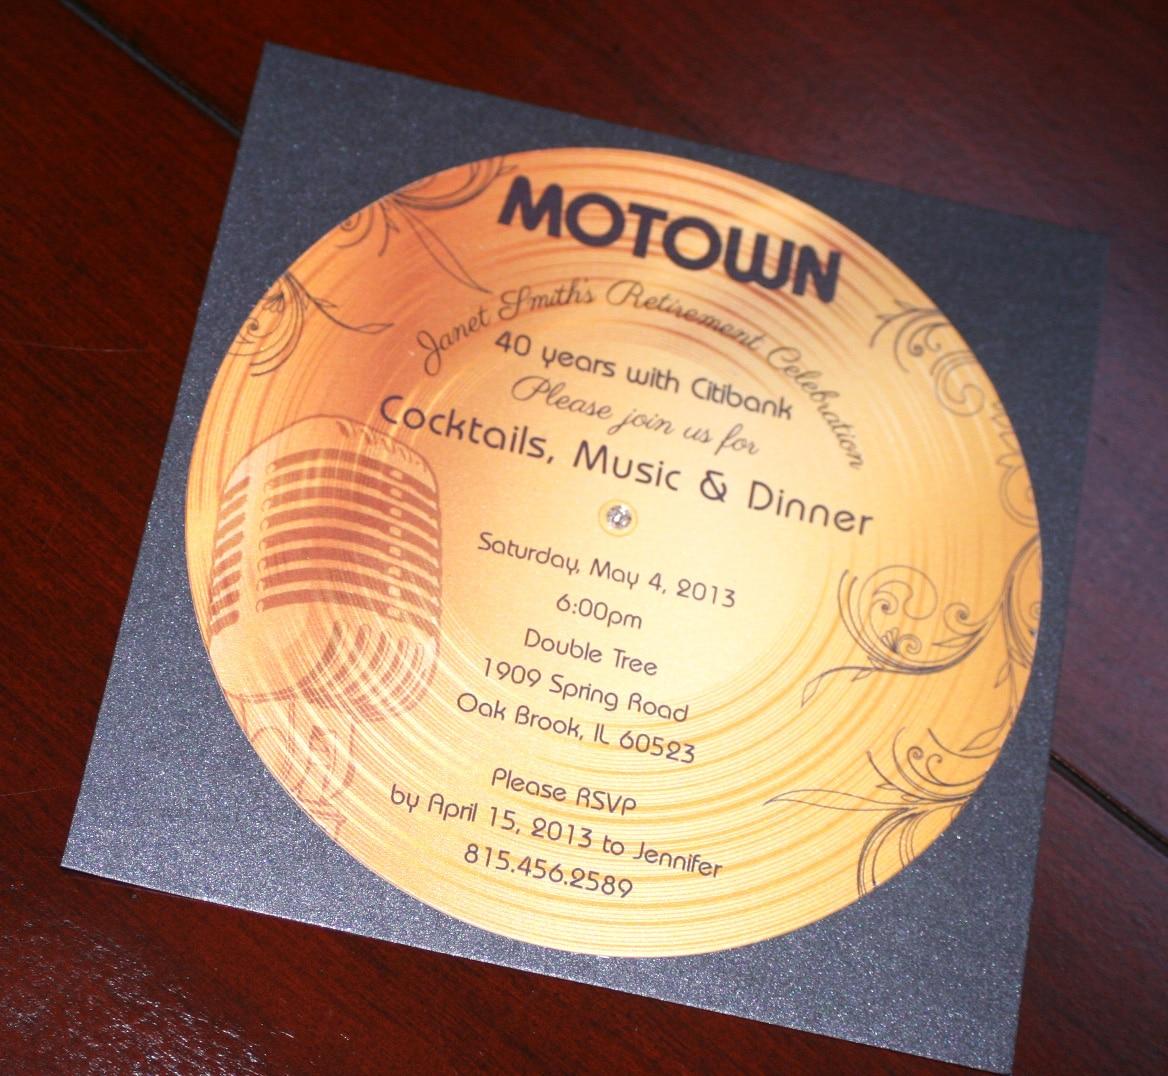 Gold Record Motown Retirement Invitation - Too Chic ...